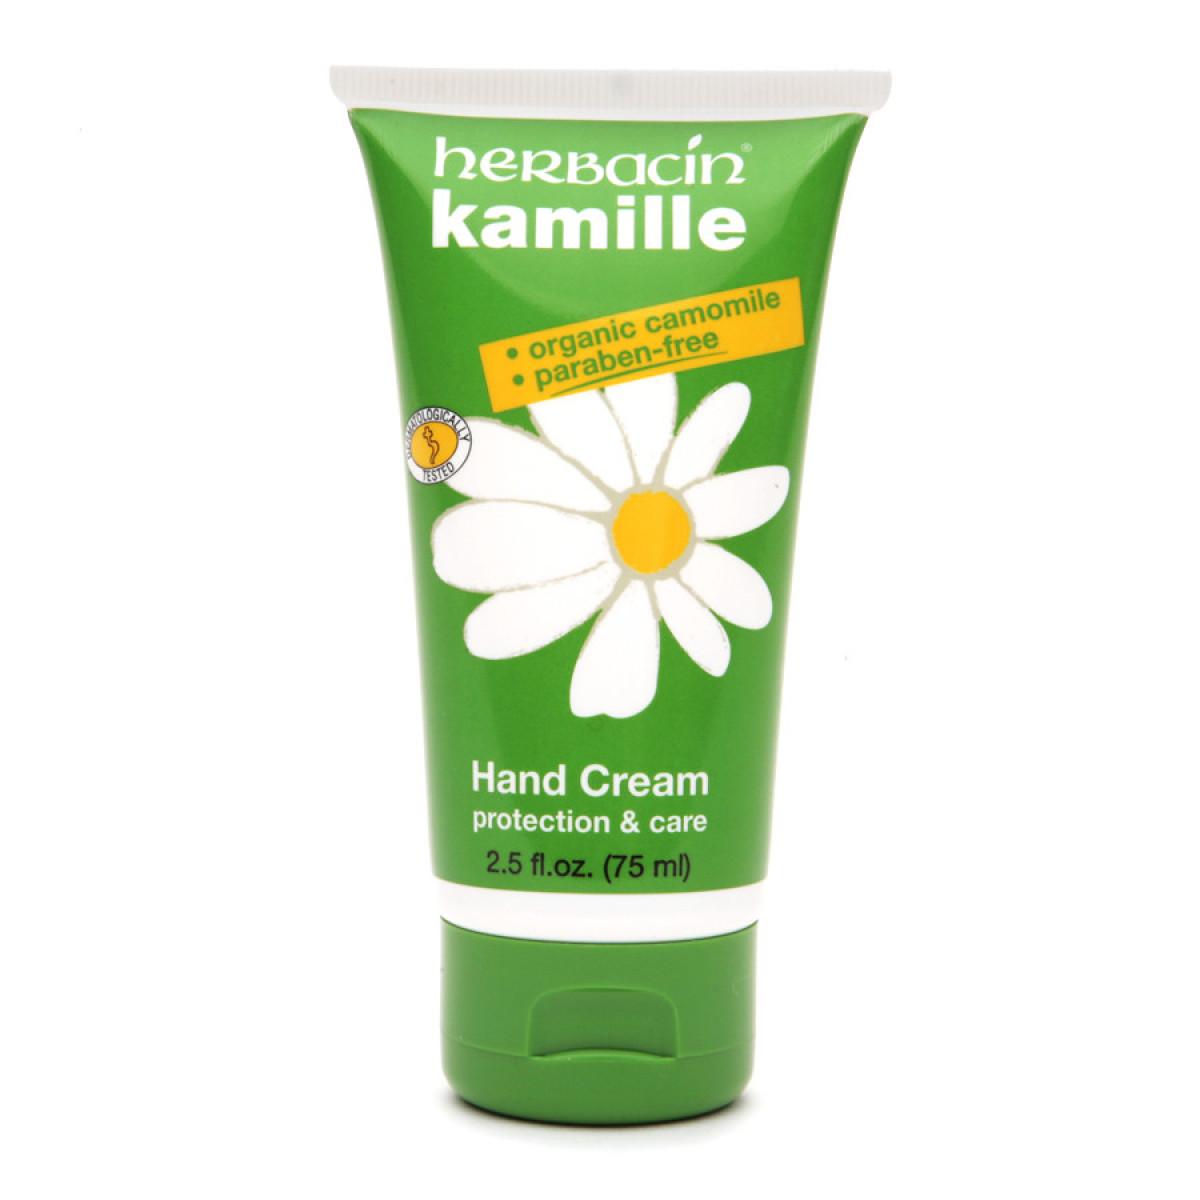 Herbacin Kamille Hand Cream, 3.4   Hand cream, Cream